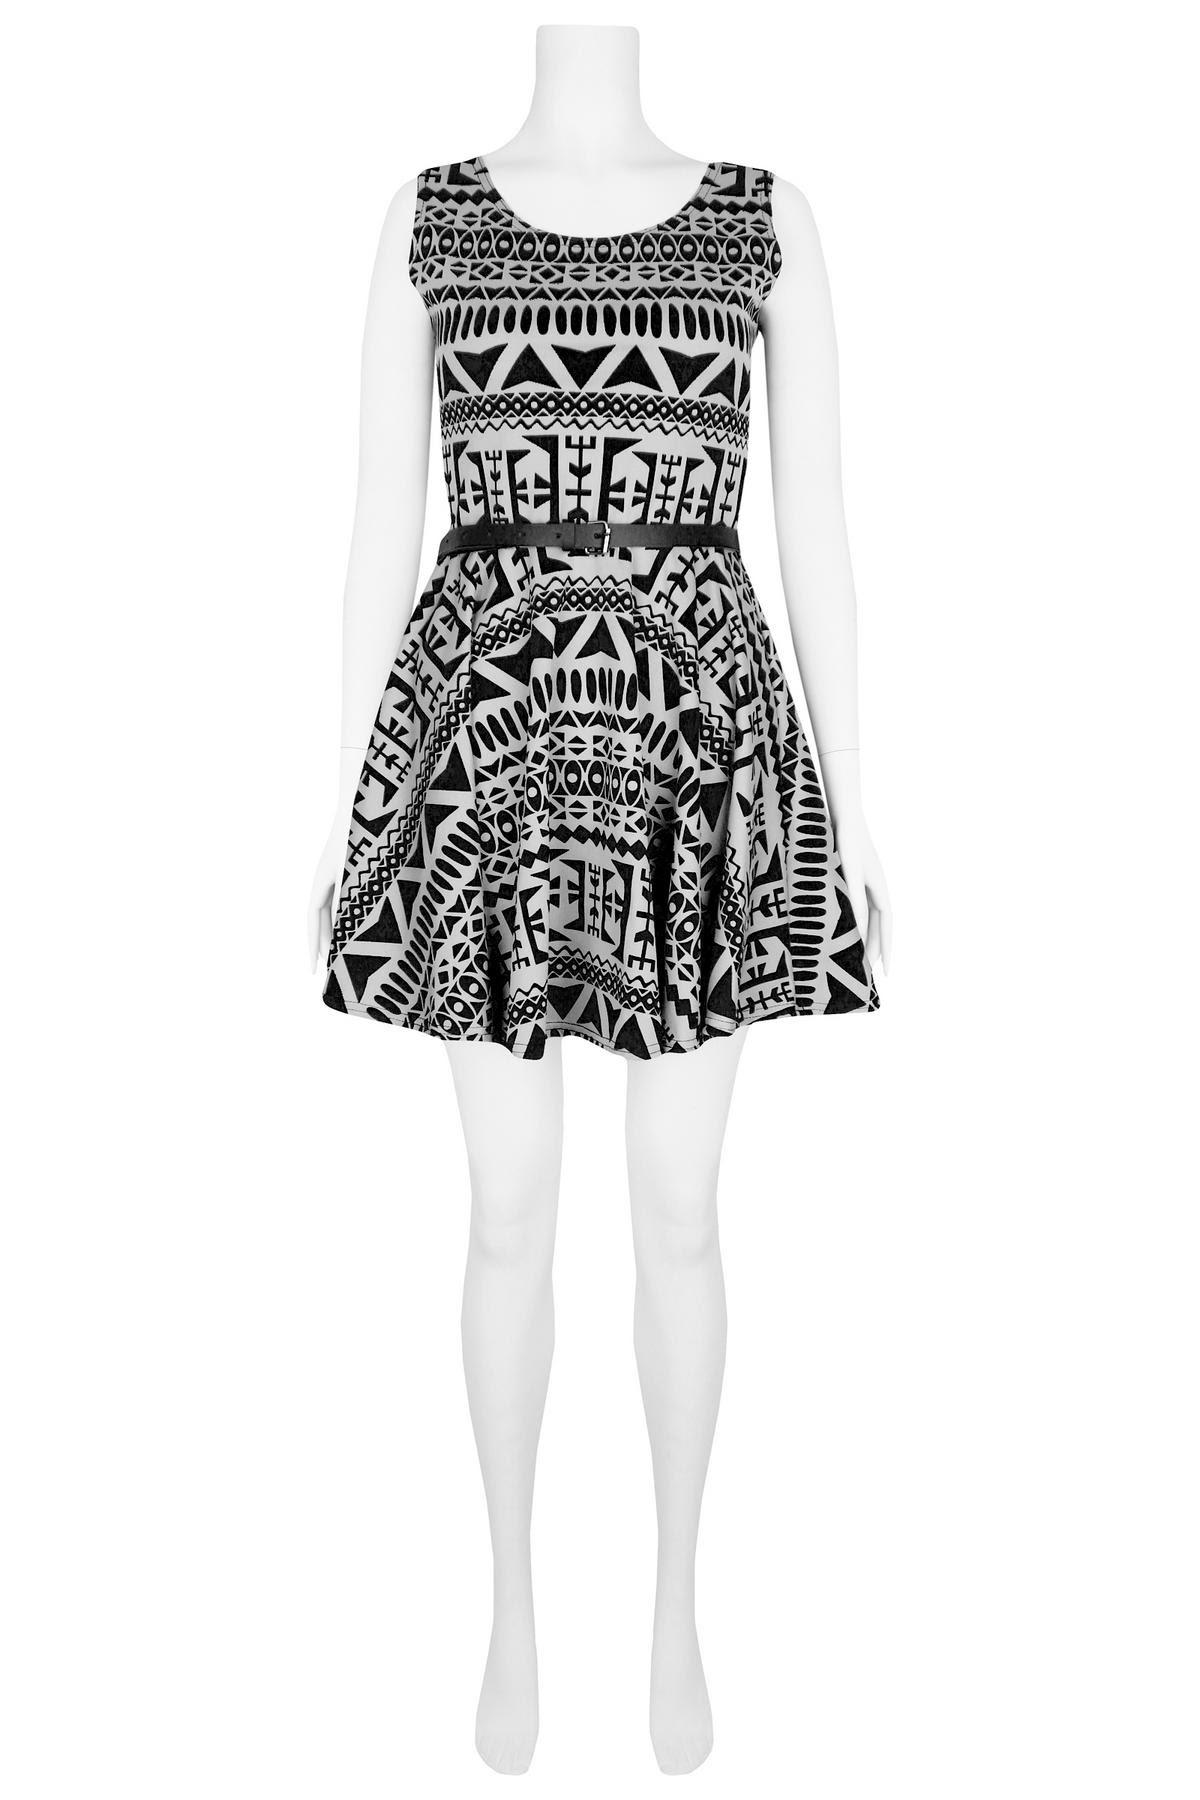 View Item Black & White Aztec Dress